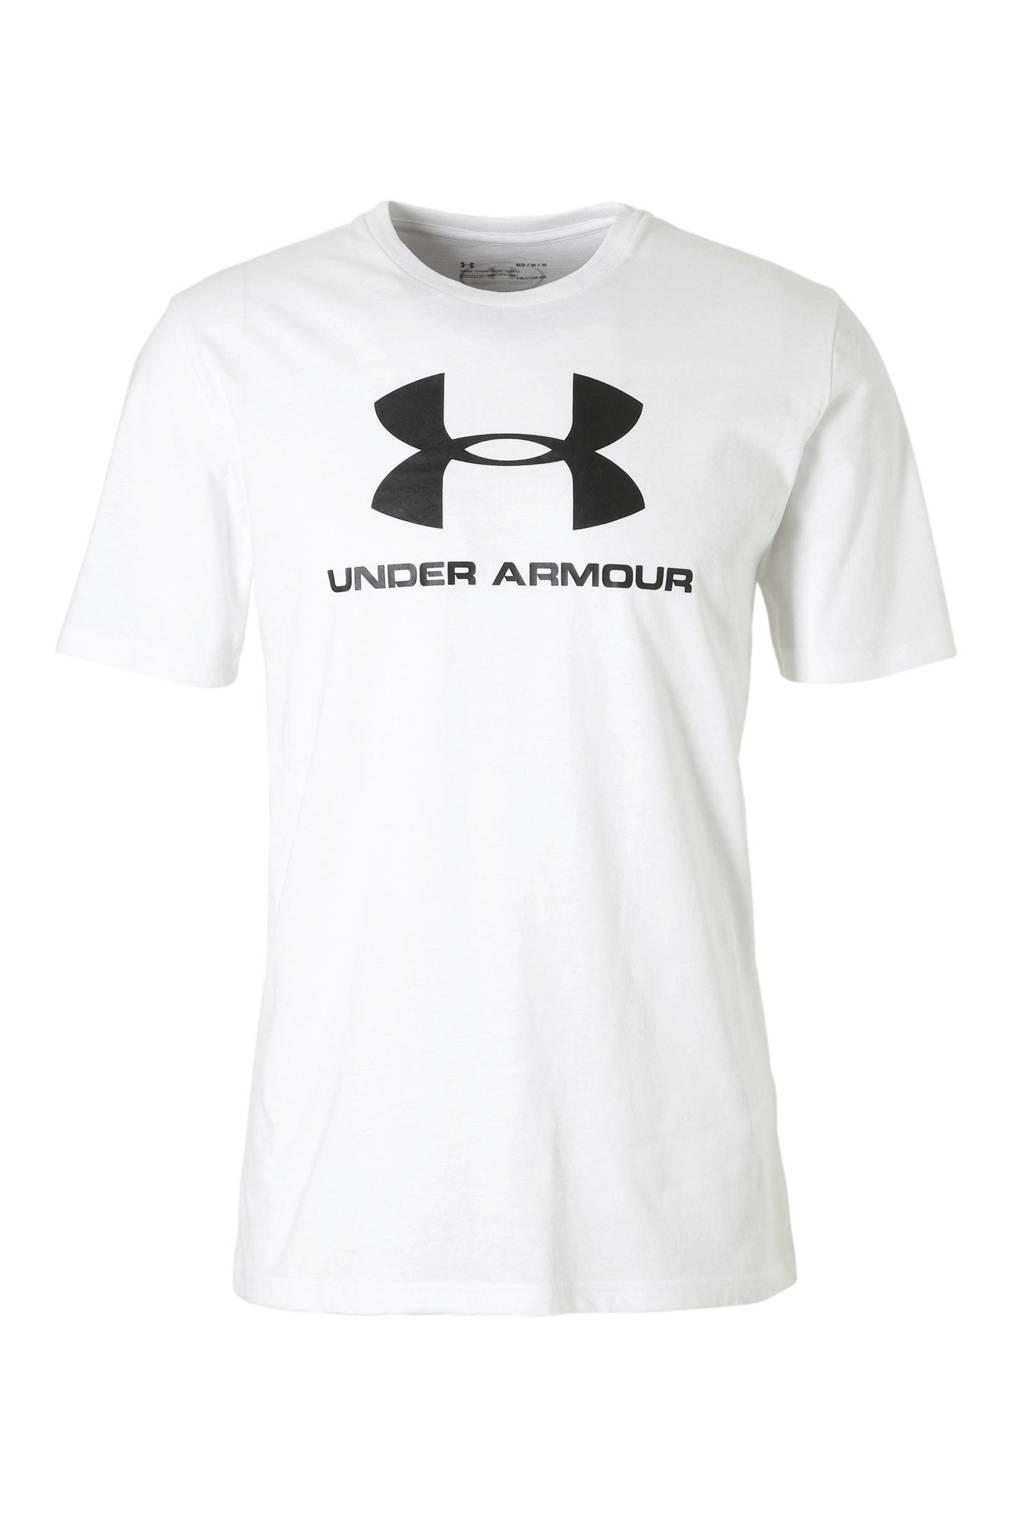 Under Armour   sport T-shirt wit, Wit/zwart